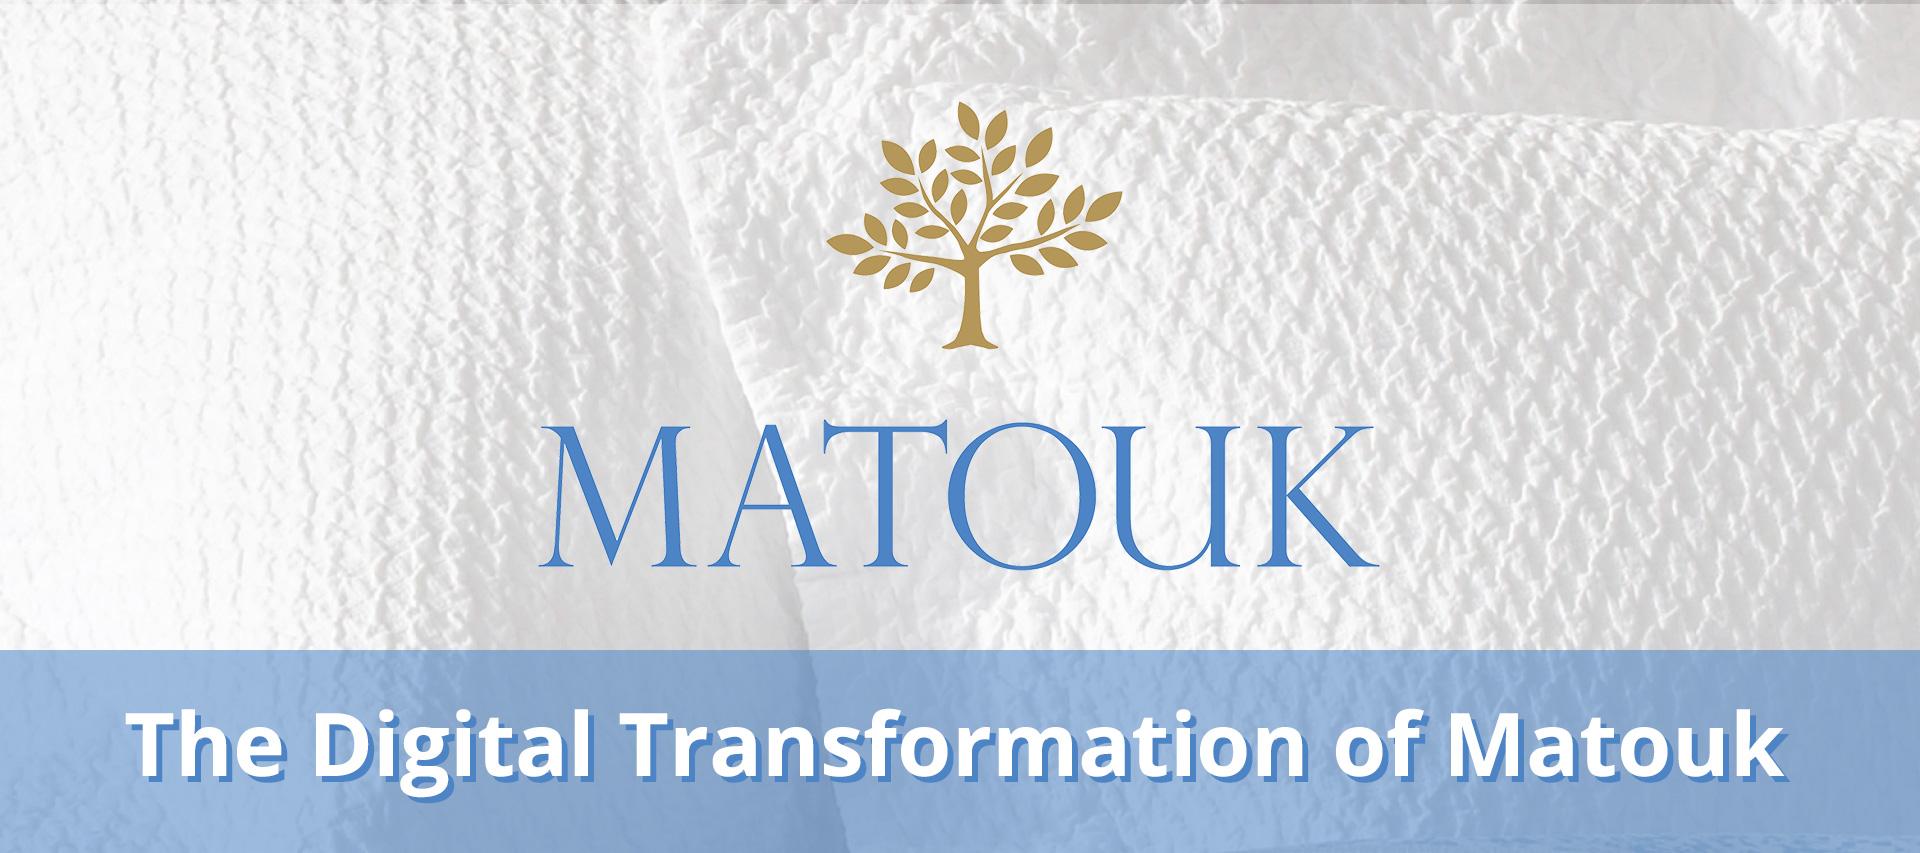 Matouk Digital Transformation